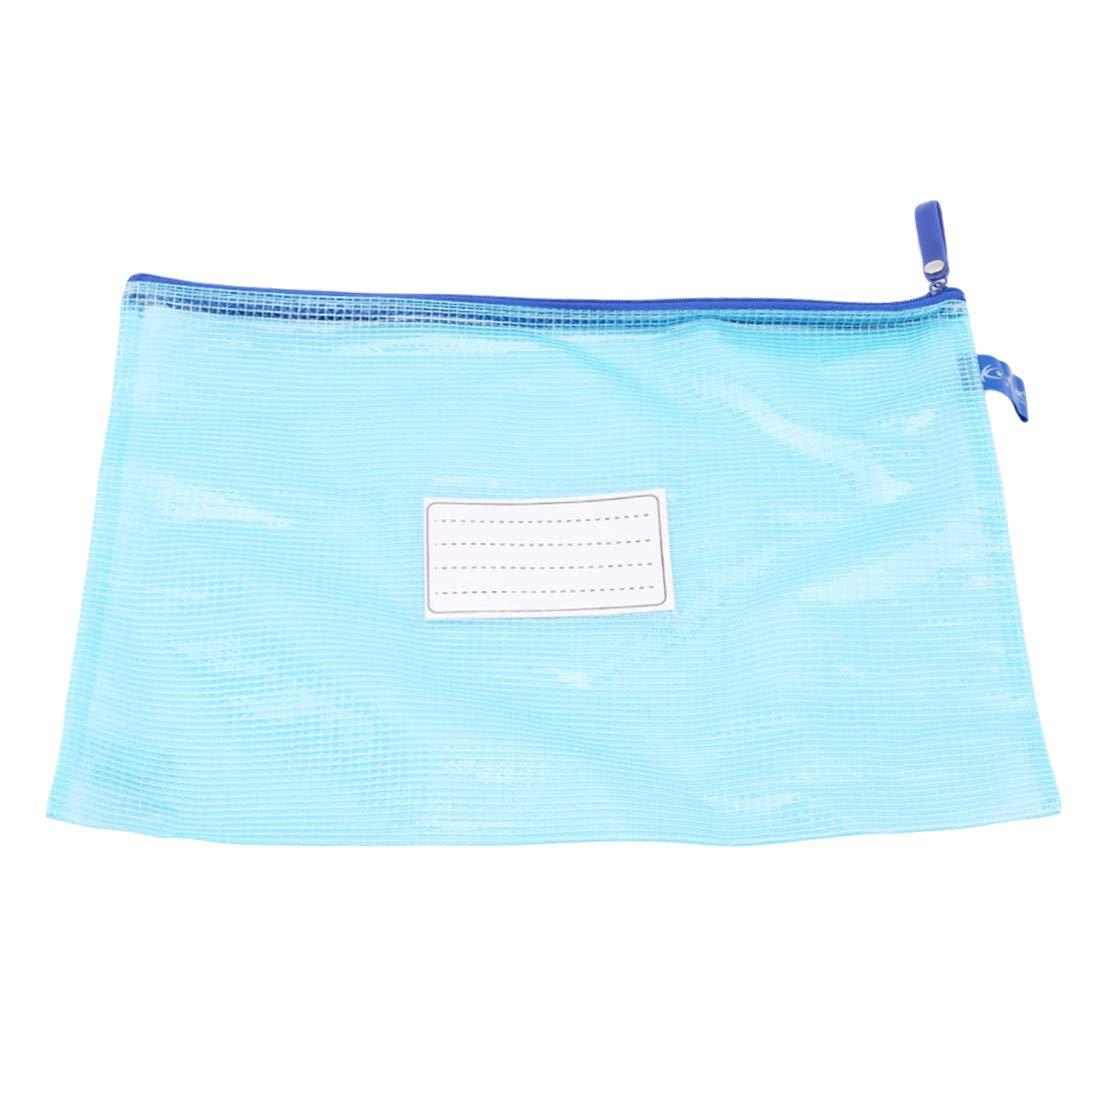 VWH Waterproof Plastic Zipper Papier Datei Ordner Buch Bleistift Stift Tasche Dokumententasche blau